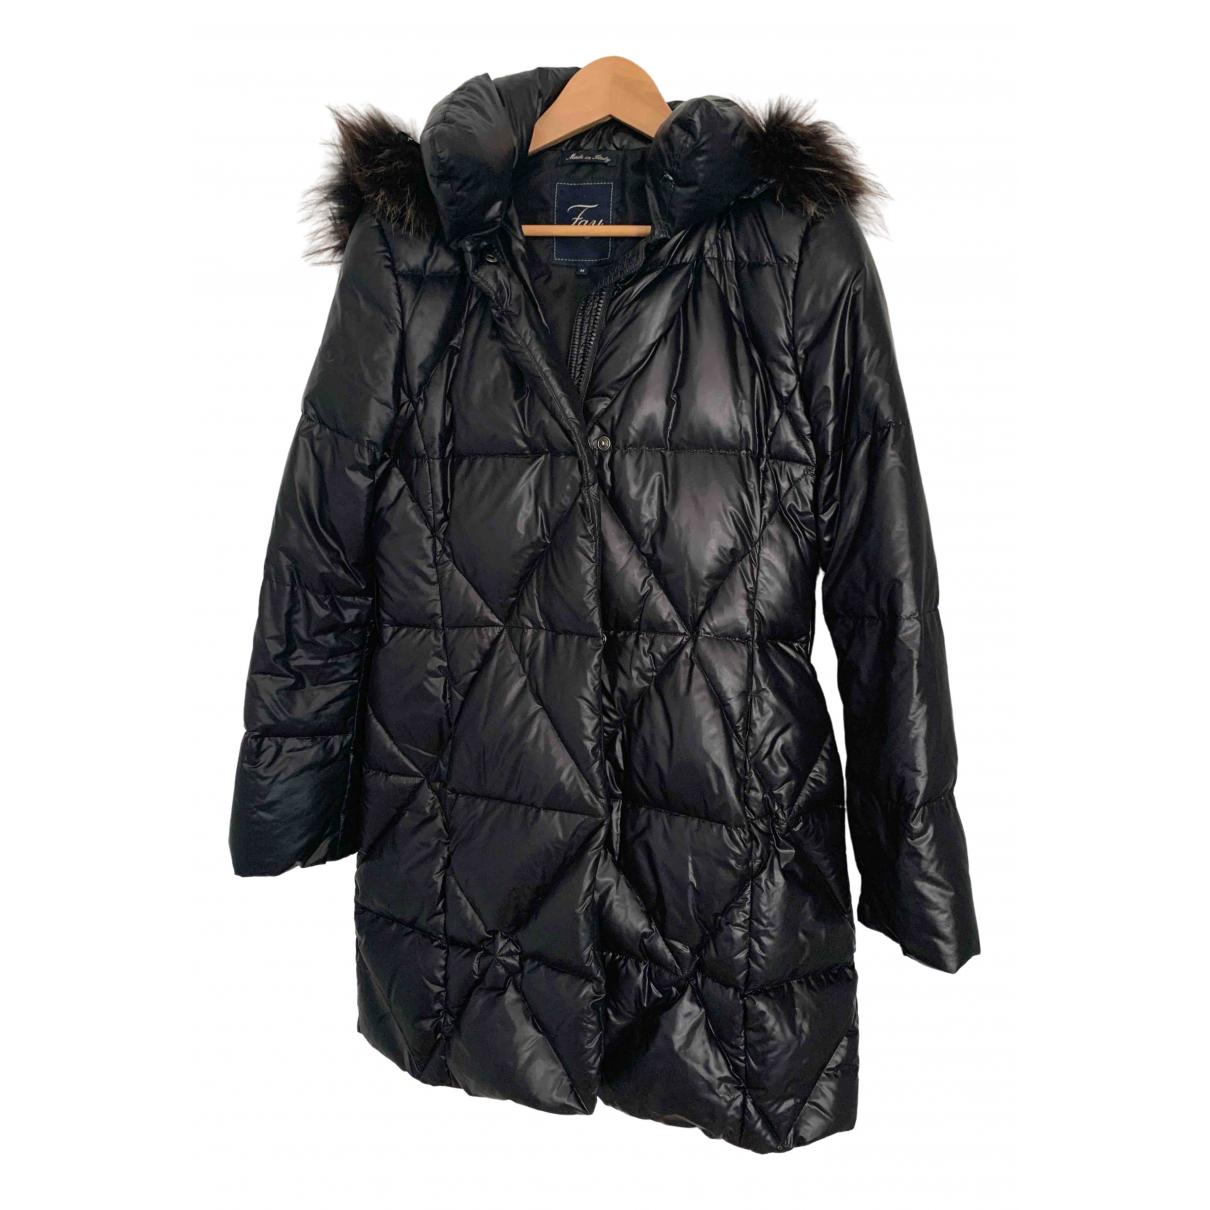 Fay \N Black Fur coat for Women M International